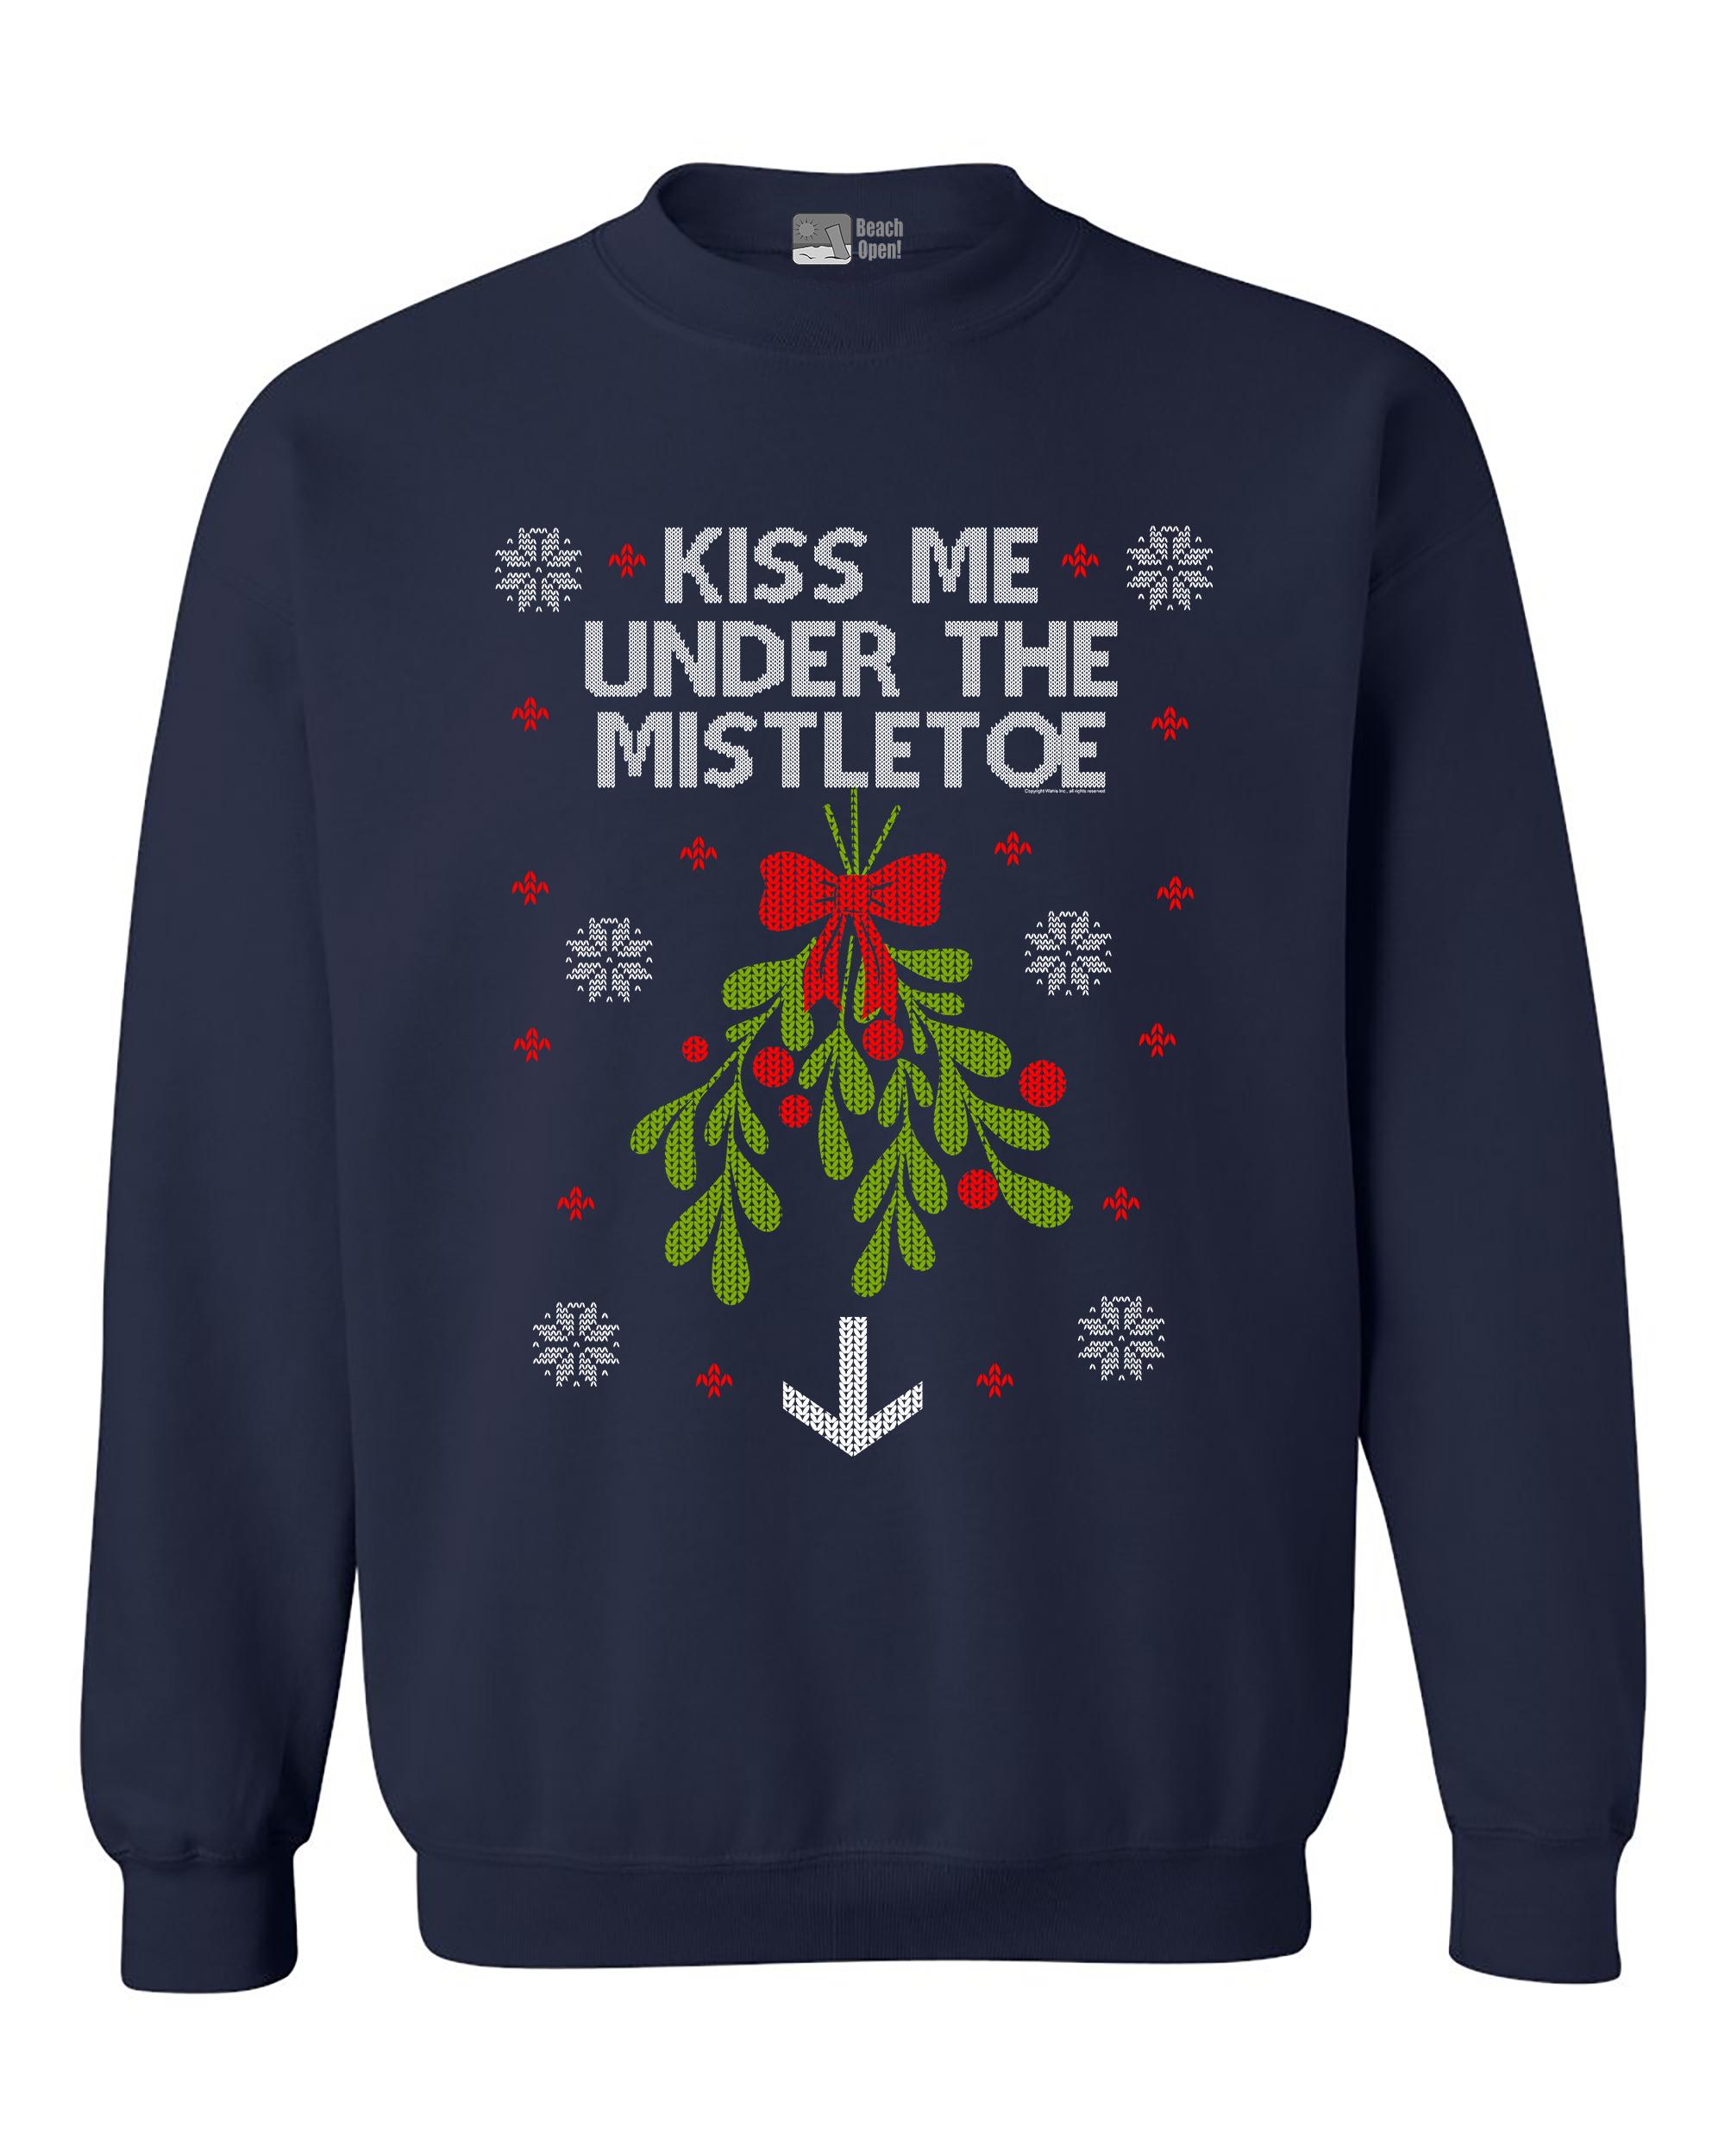 Kiss Me Under The Mistletoe Christmas Holidays Funny DT Crewneck Sweatshirt